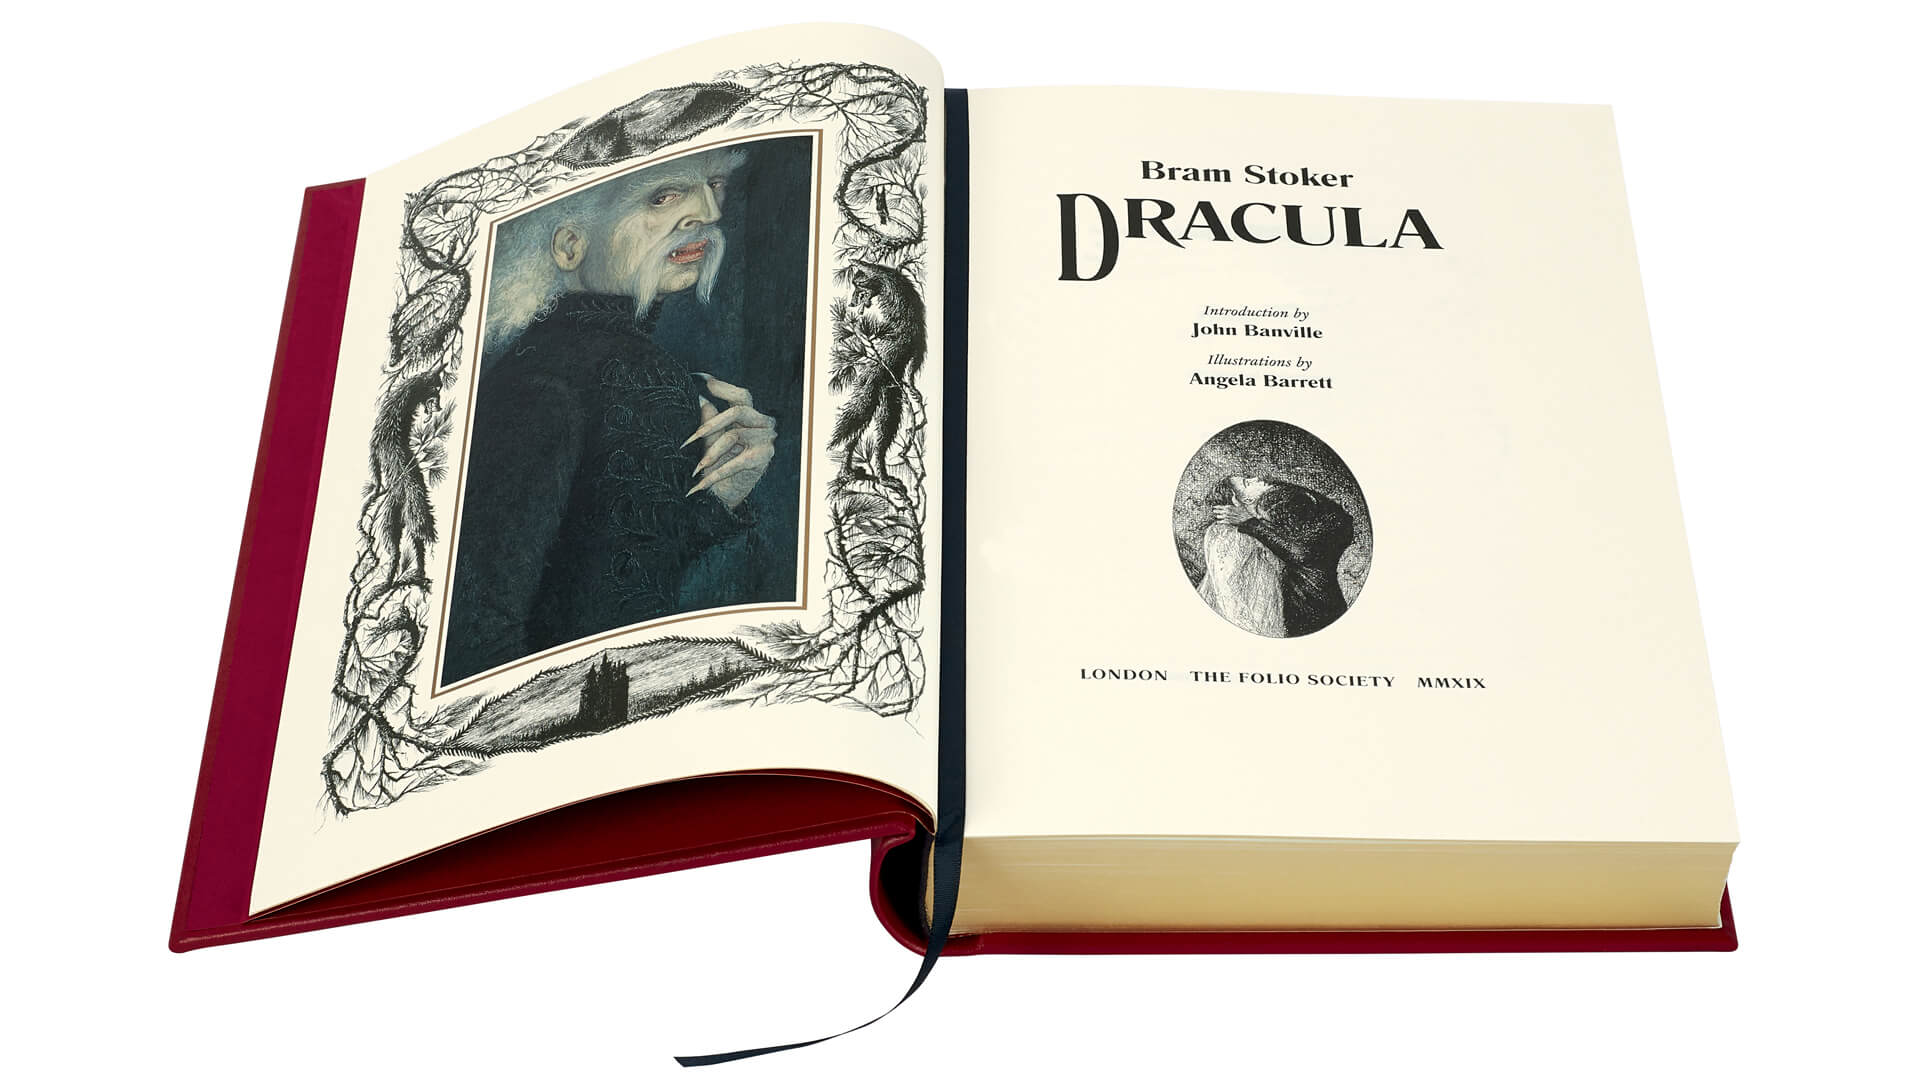 Dracula book inside